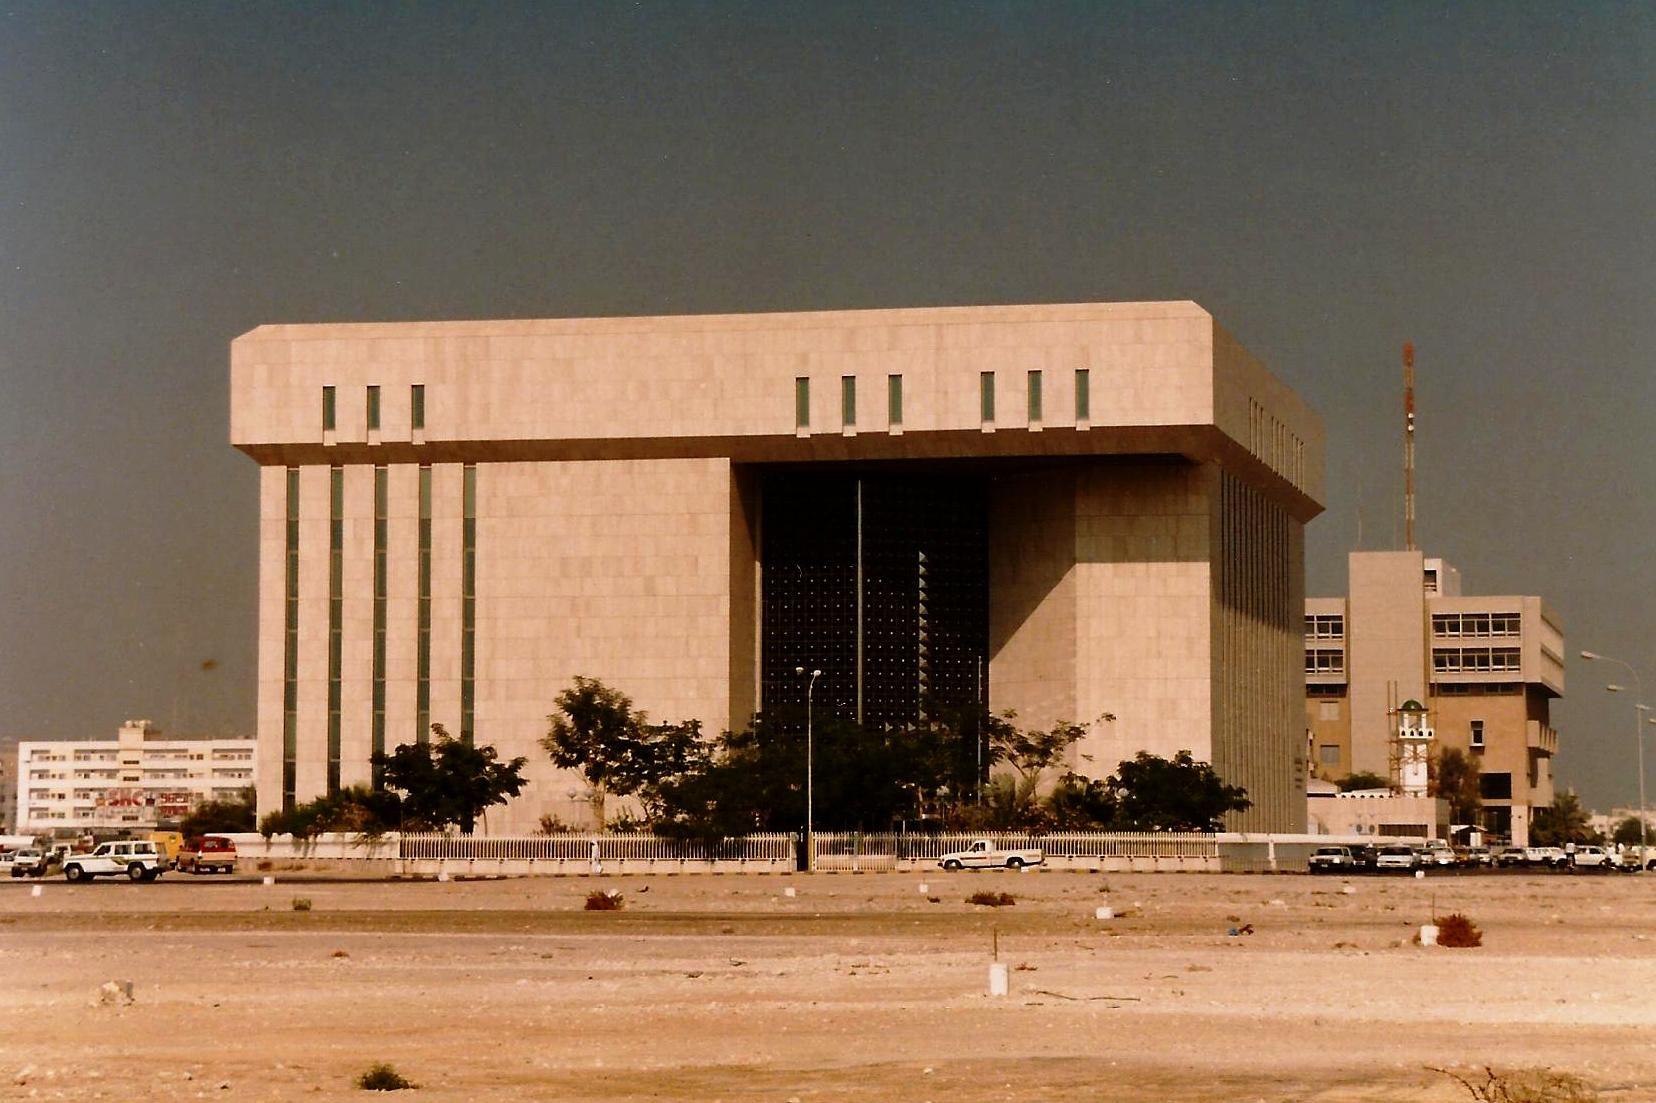 Dammam Typical Architecture Dammam Saudi Arabia Architecture